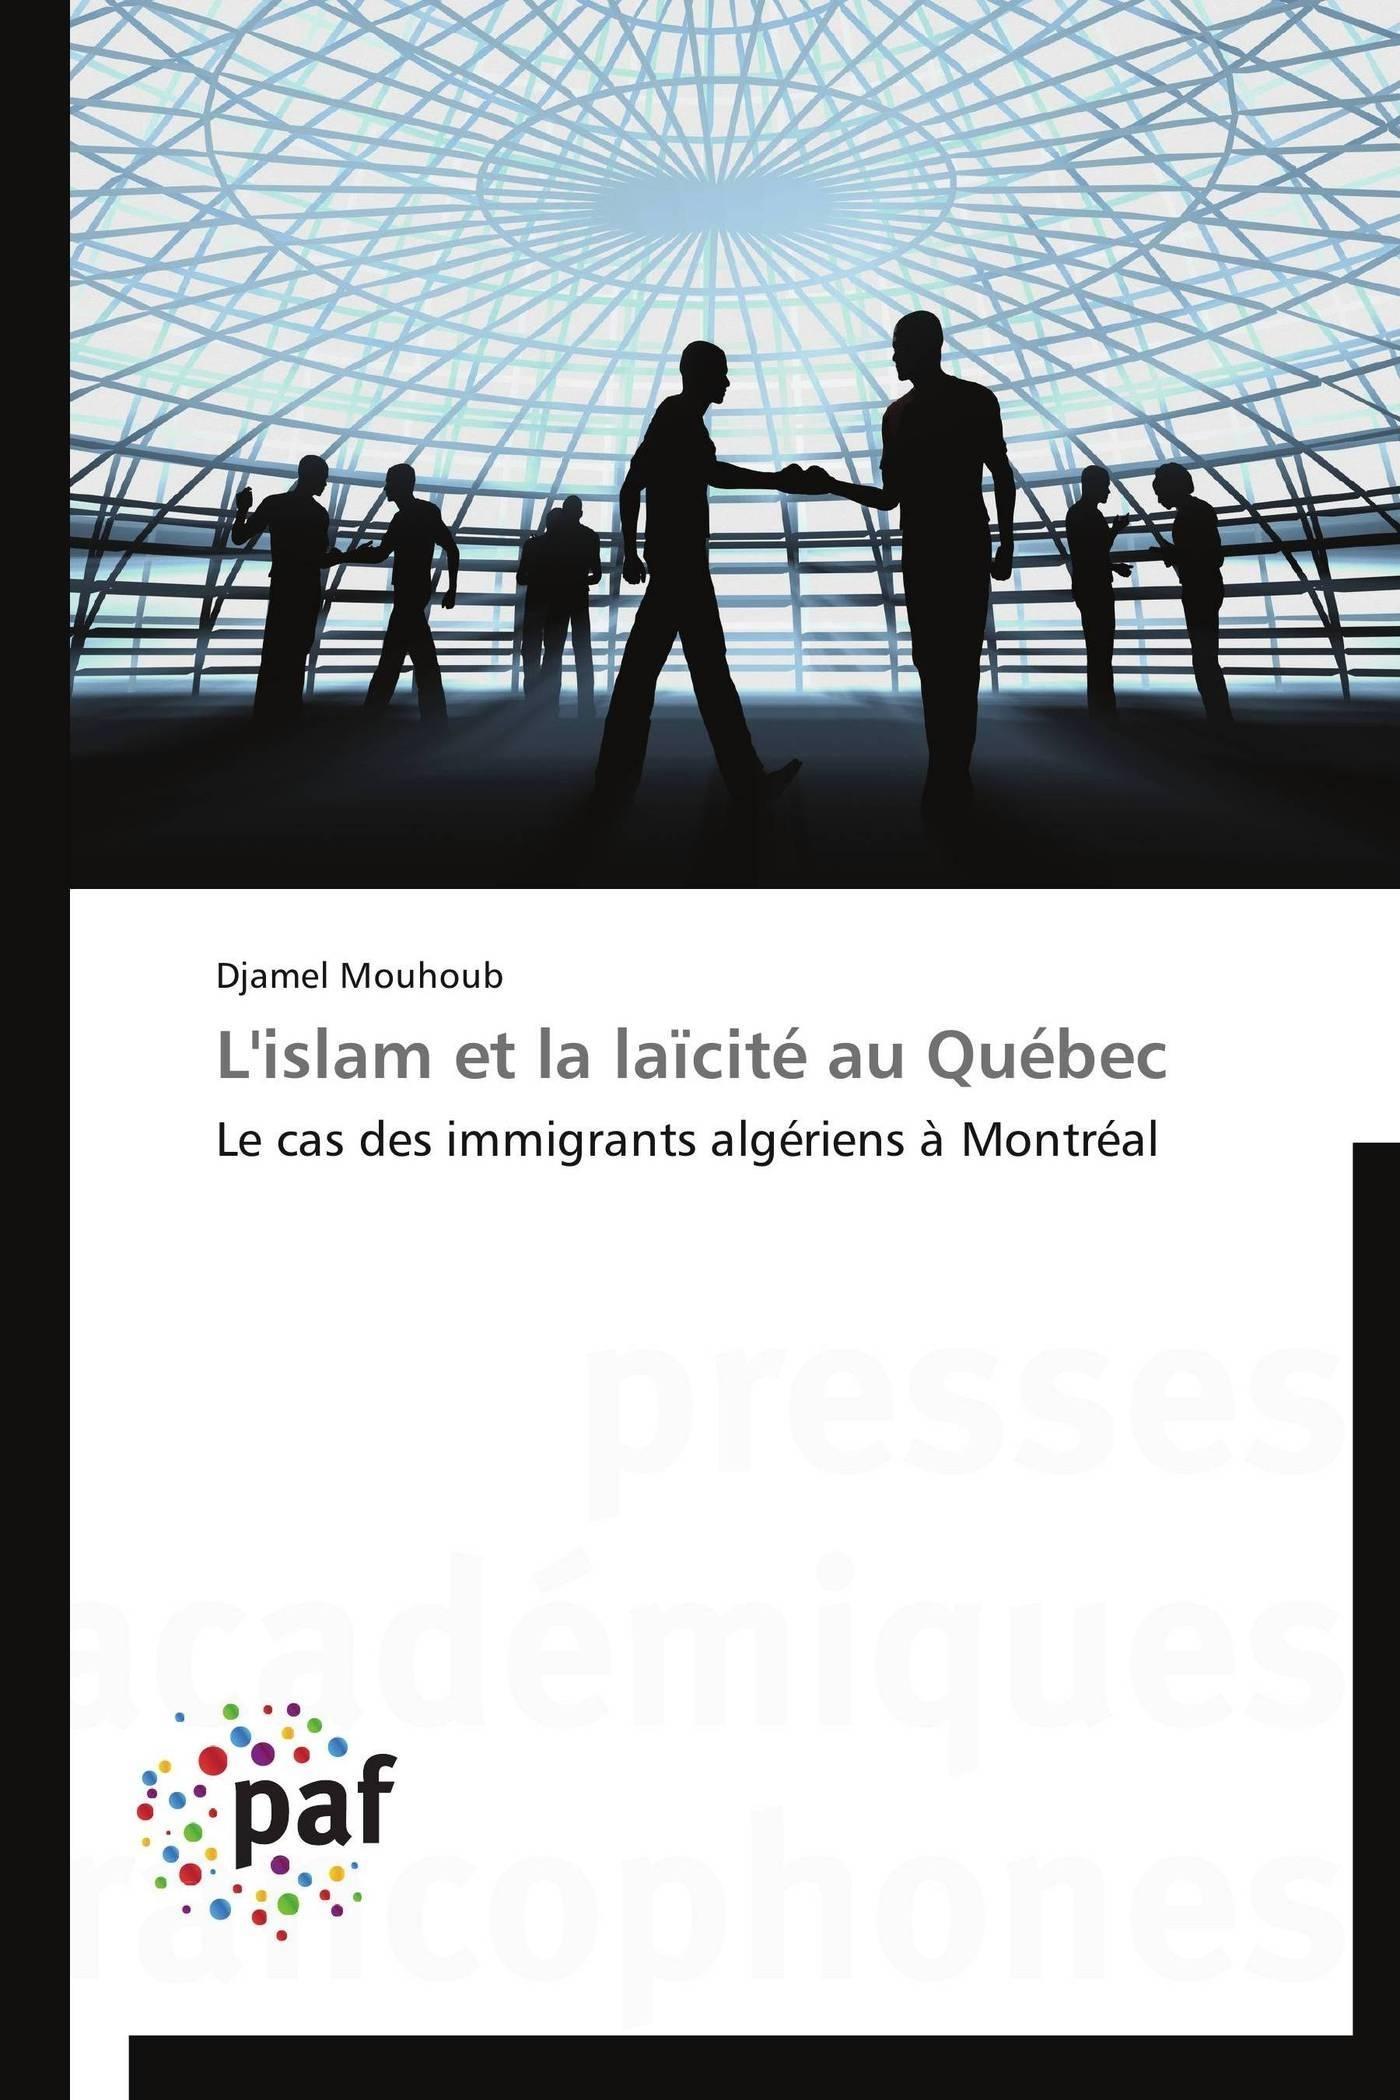 L'ISLAM ET LA LAICITE AU QUEBEC